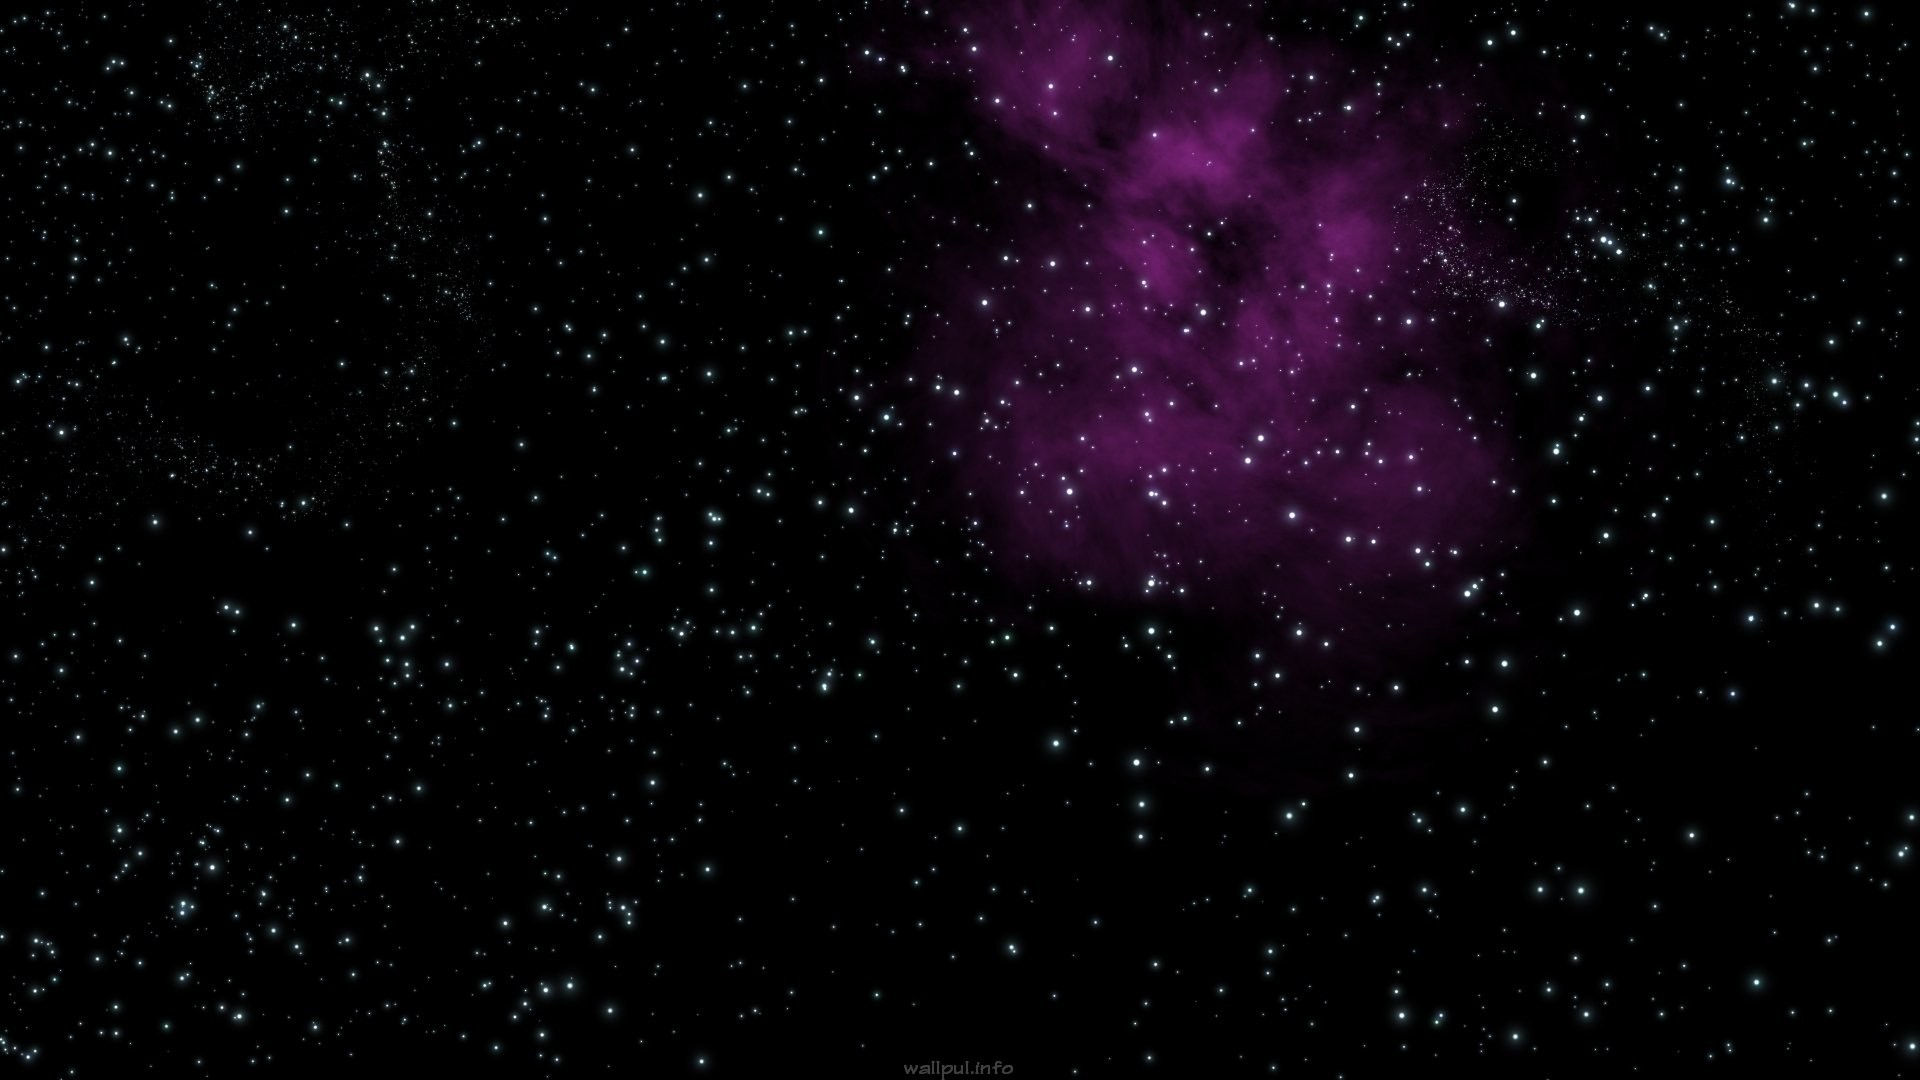 … Space Galaxy Wallpaper 1080p …